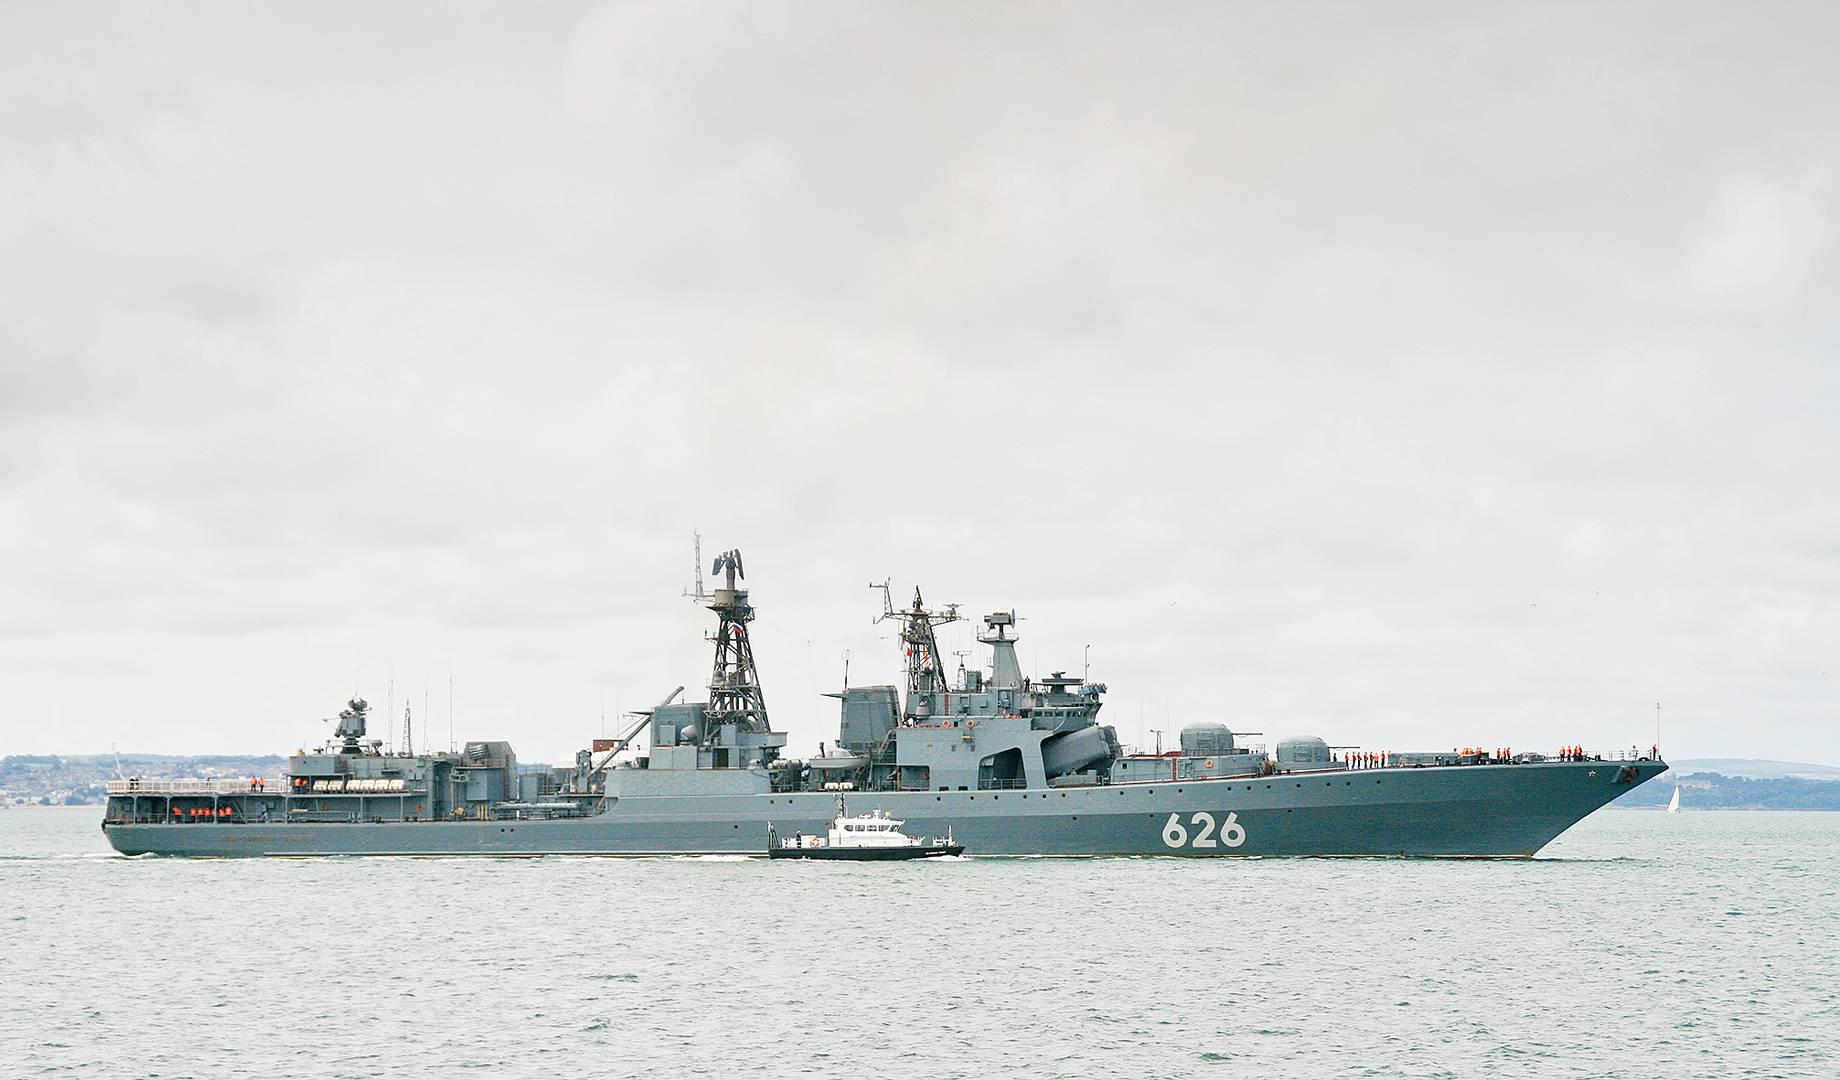 Противолодочный корабль «Вице-адмирал Кулаков» (фото — Брайн Бурнелл)